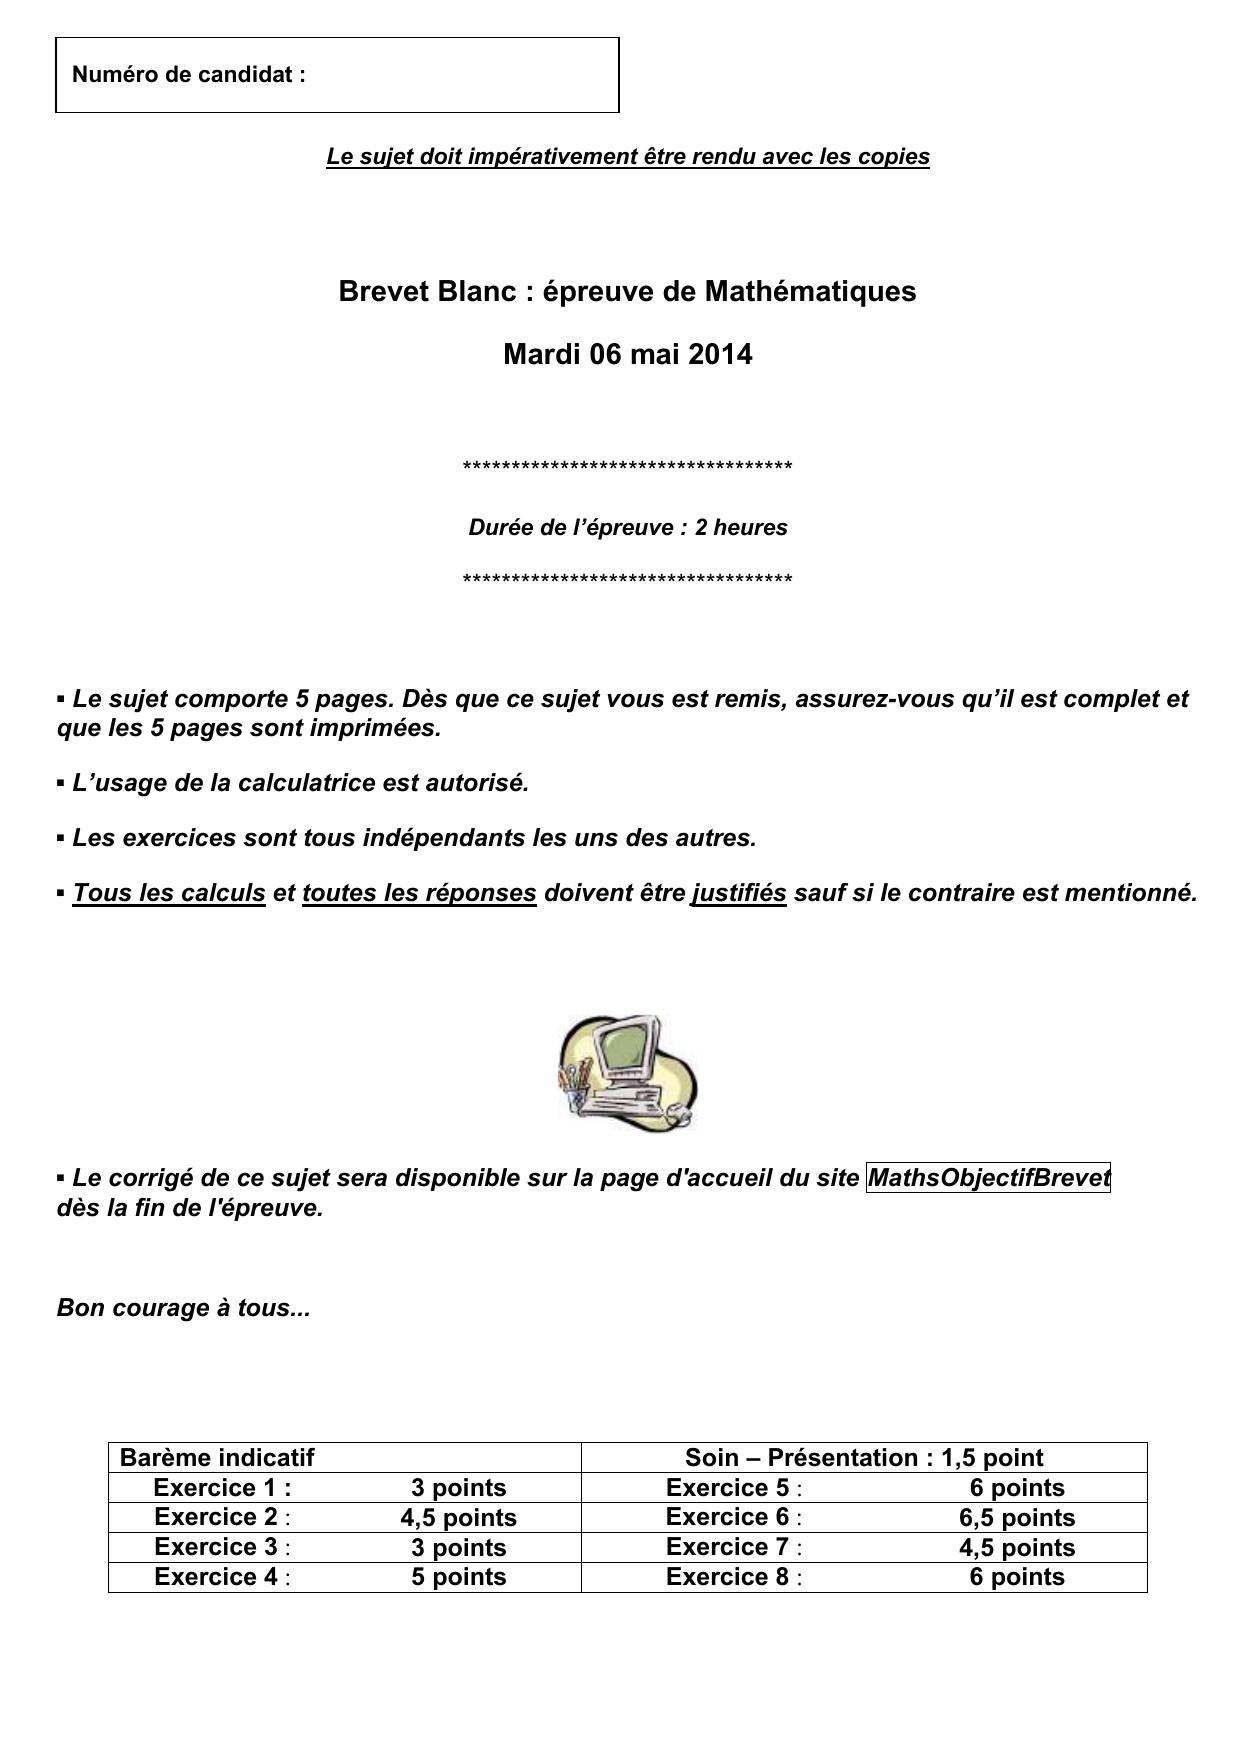 Brevet Blanc Epreuve De Mathematiques Mardi 06 Mai 2014